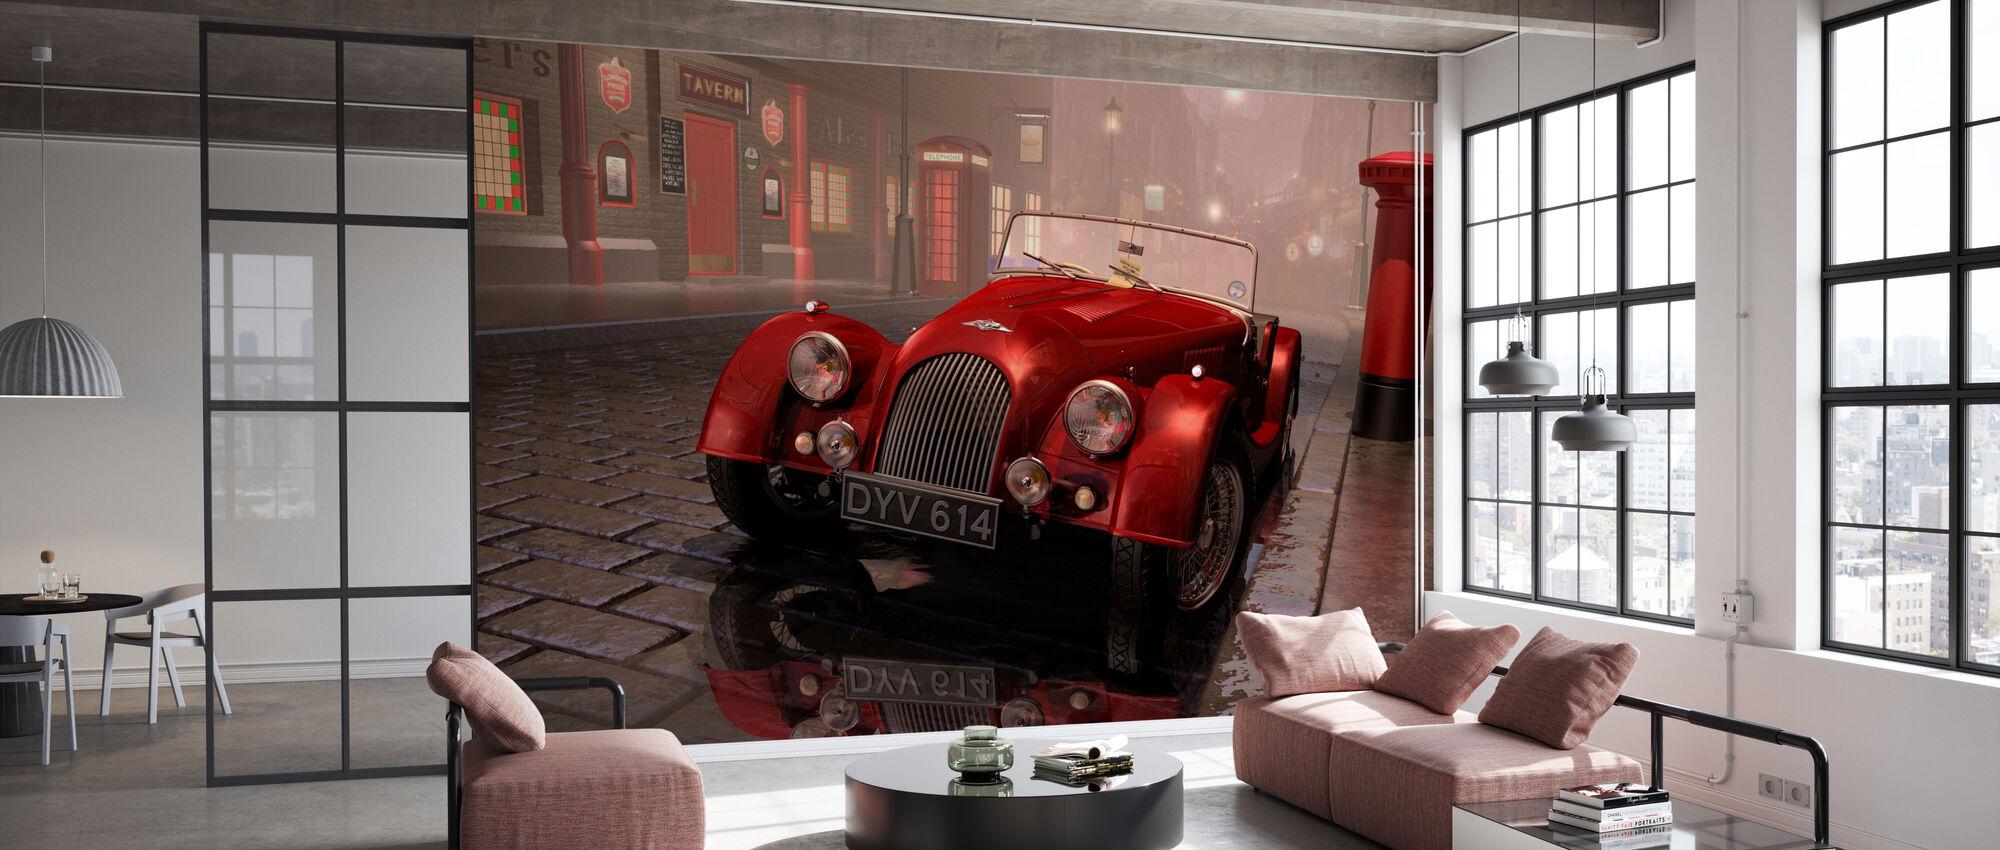 Britisk sportsbil i London - Tapet - Kontor